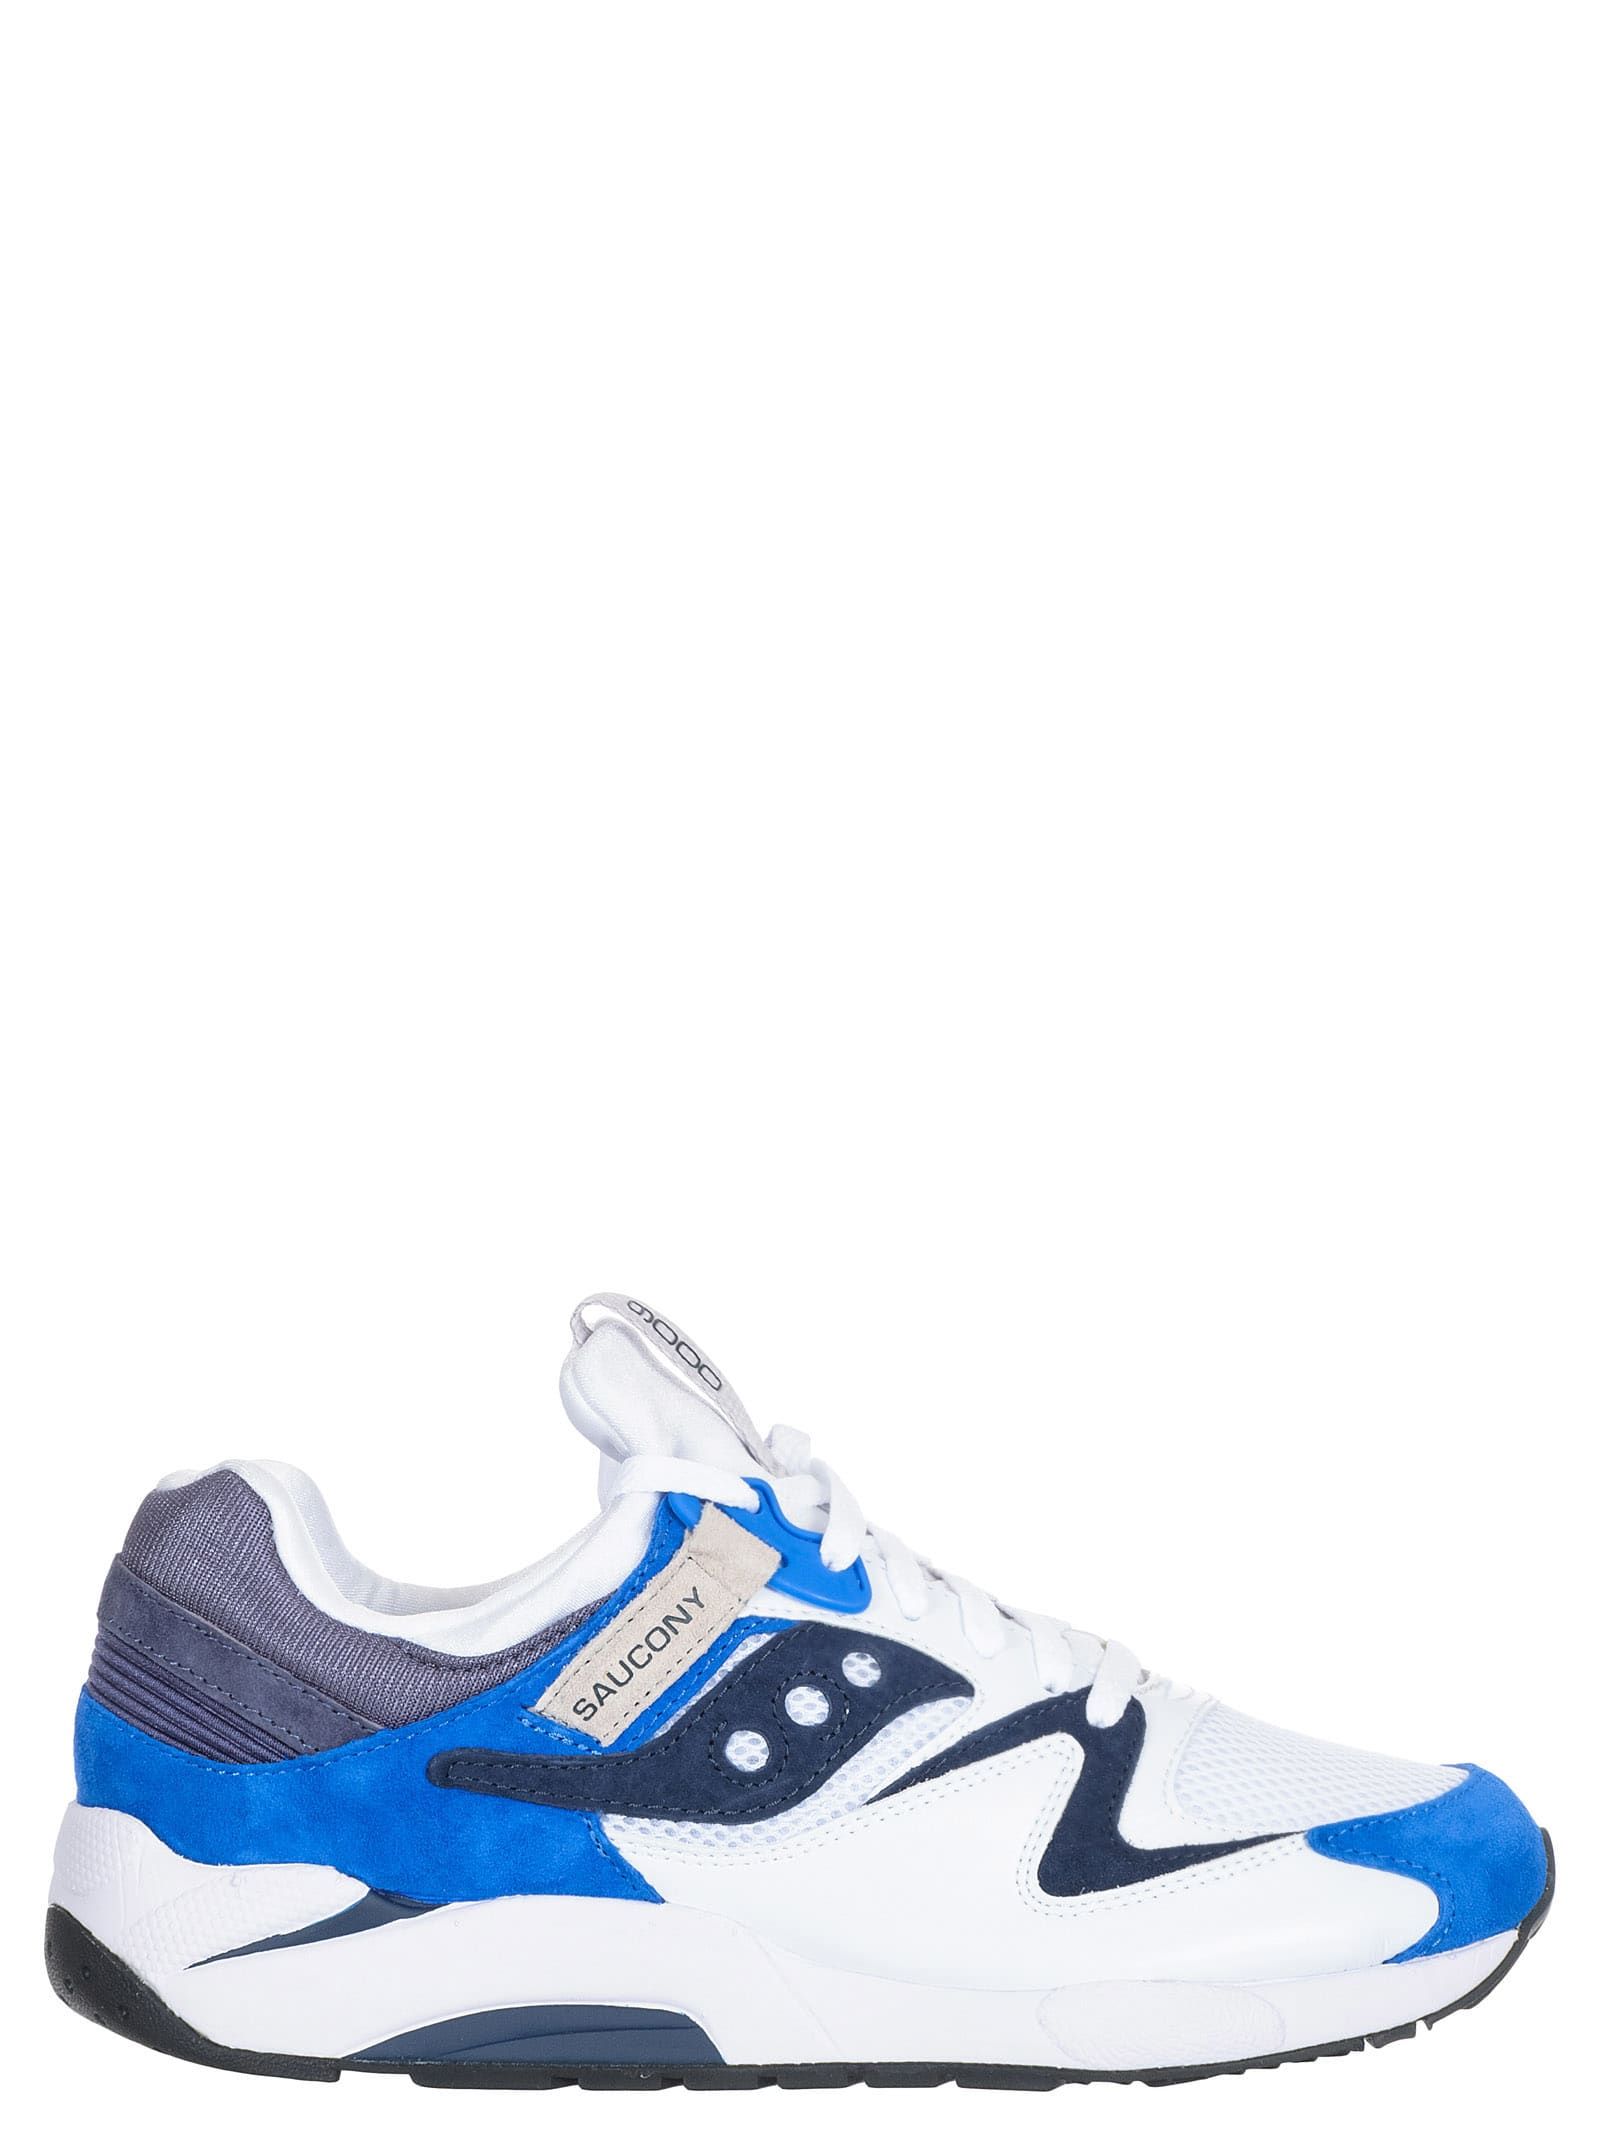 blue saucony sneakers